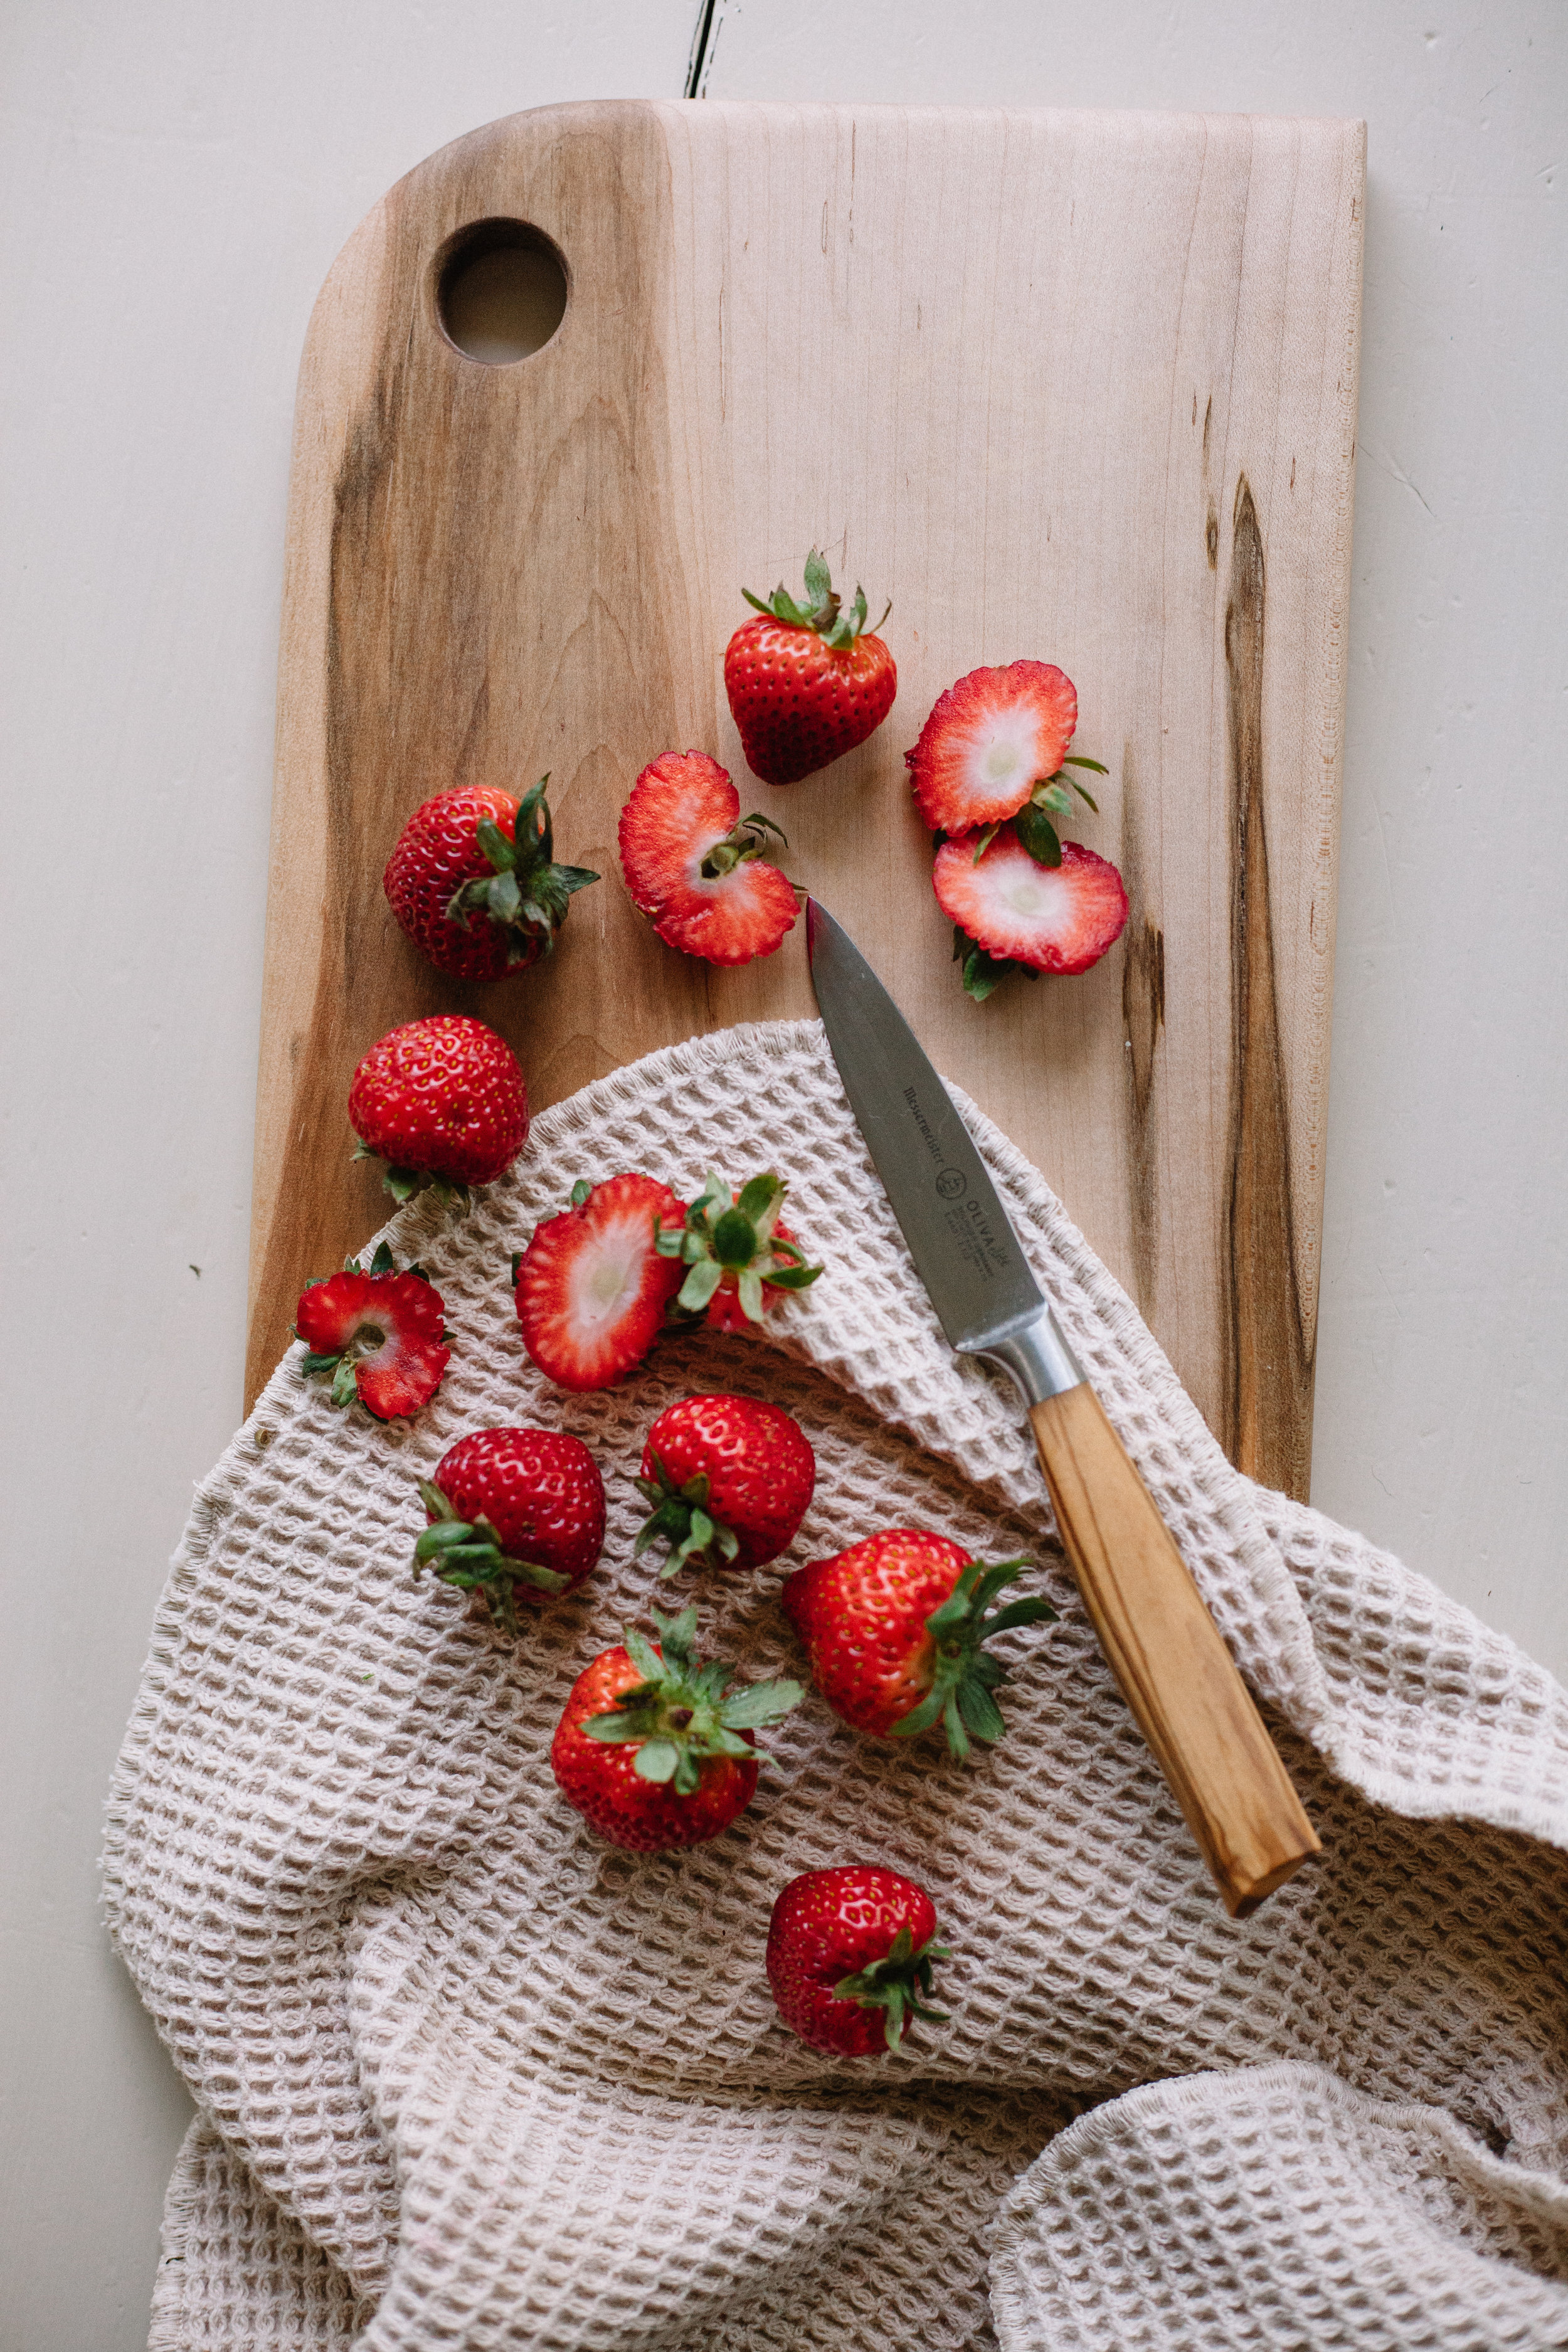 strawberry cardamom coconut milk ice cream | marina elaine gunn martin food